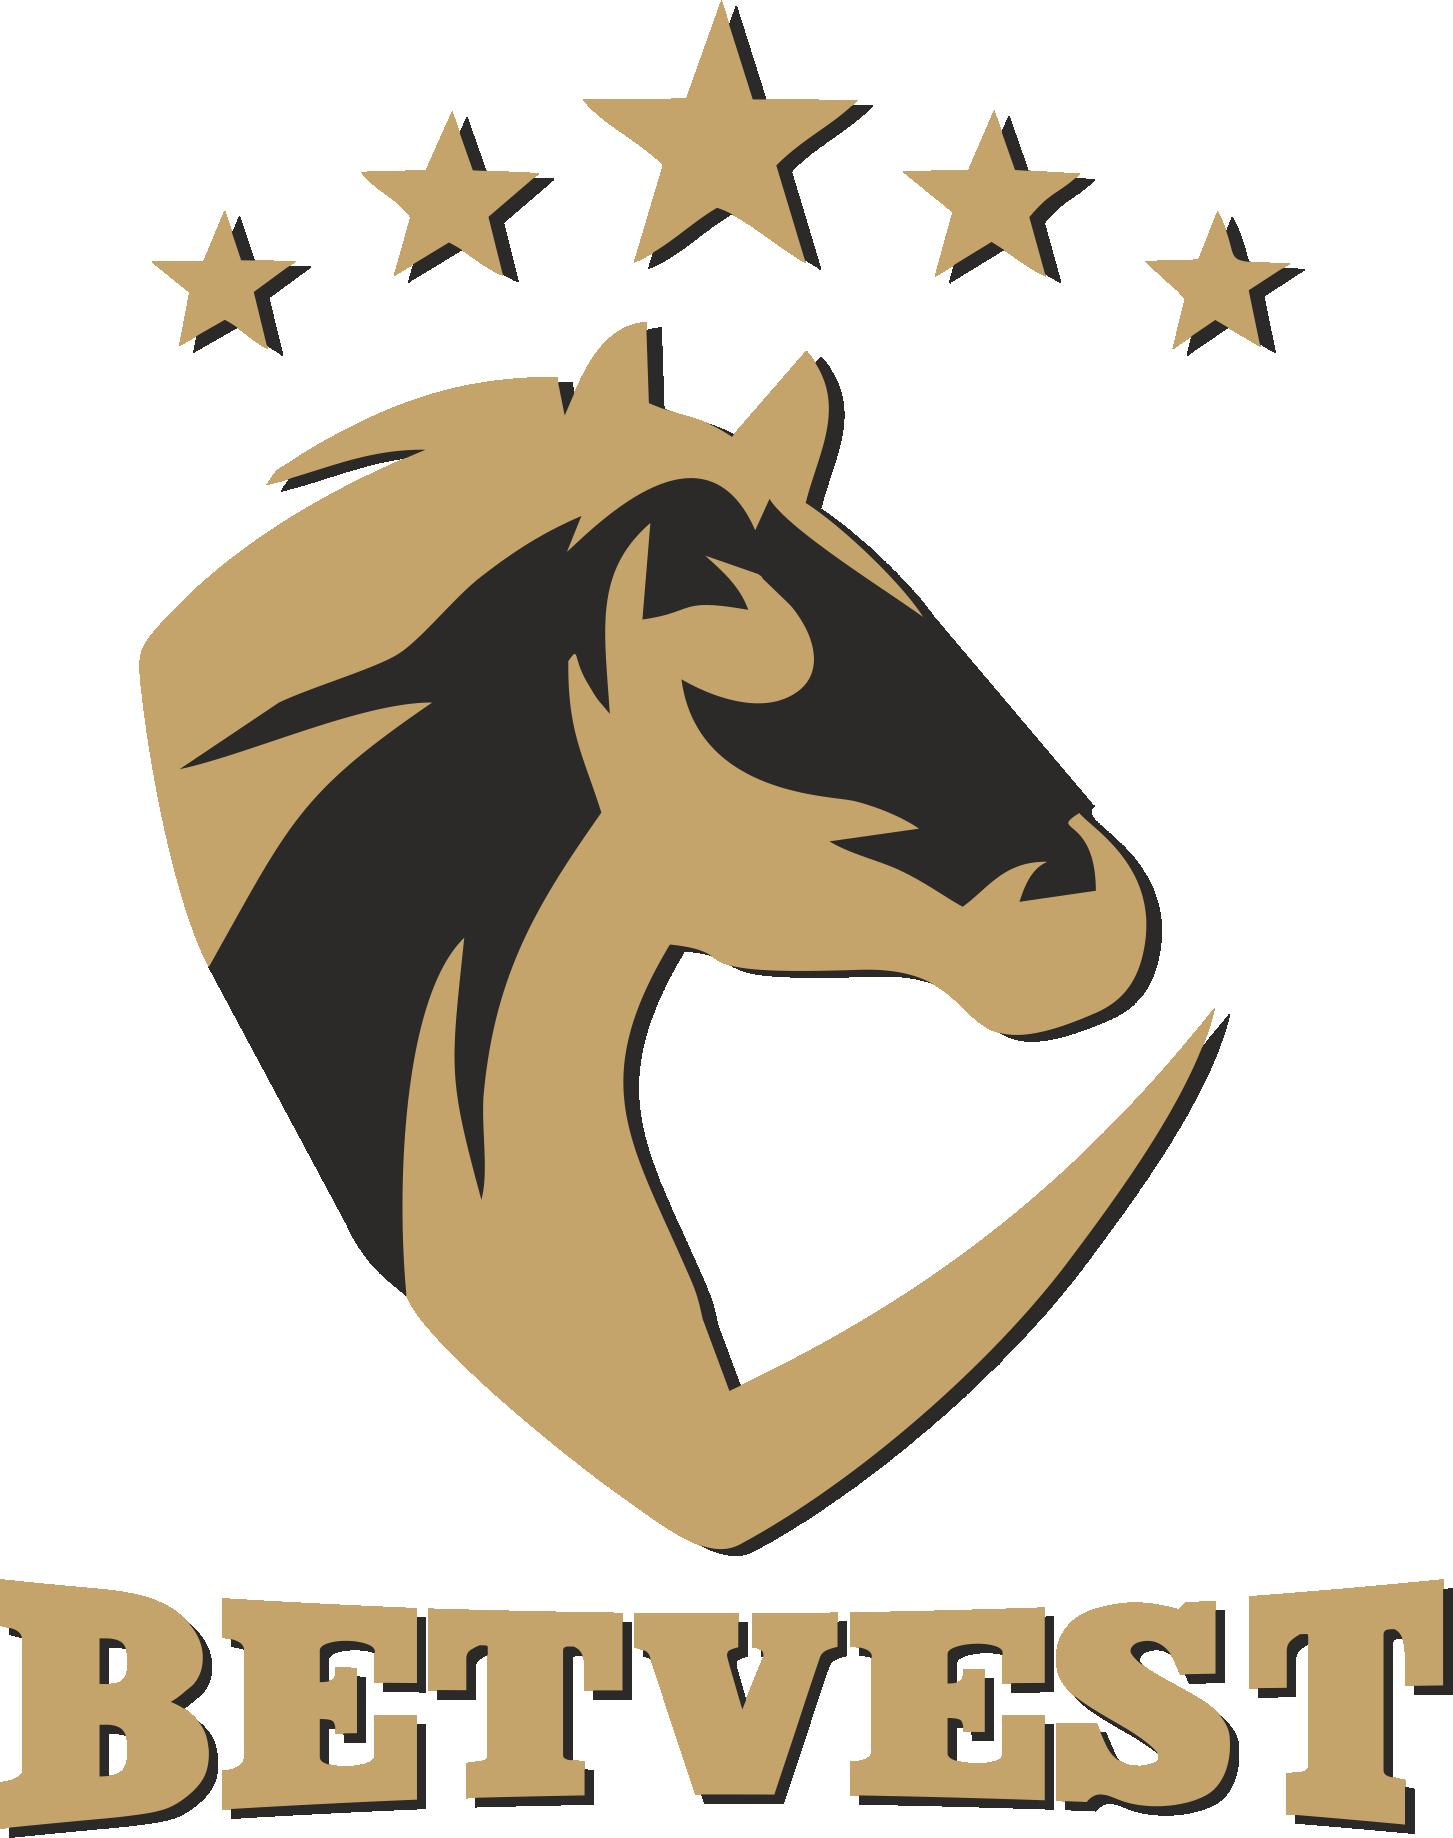 Betvest Website